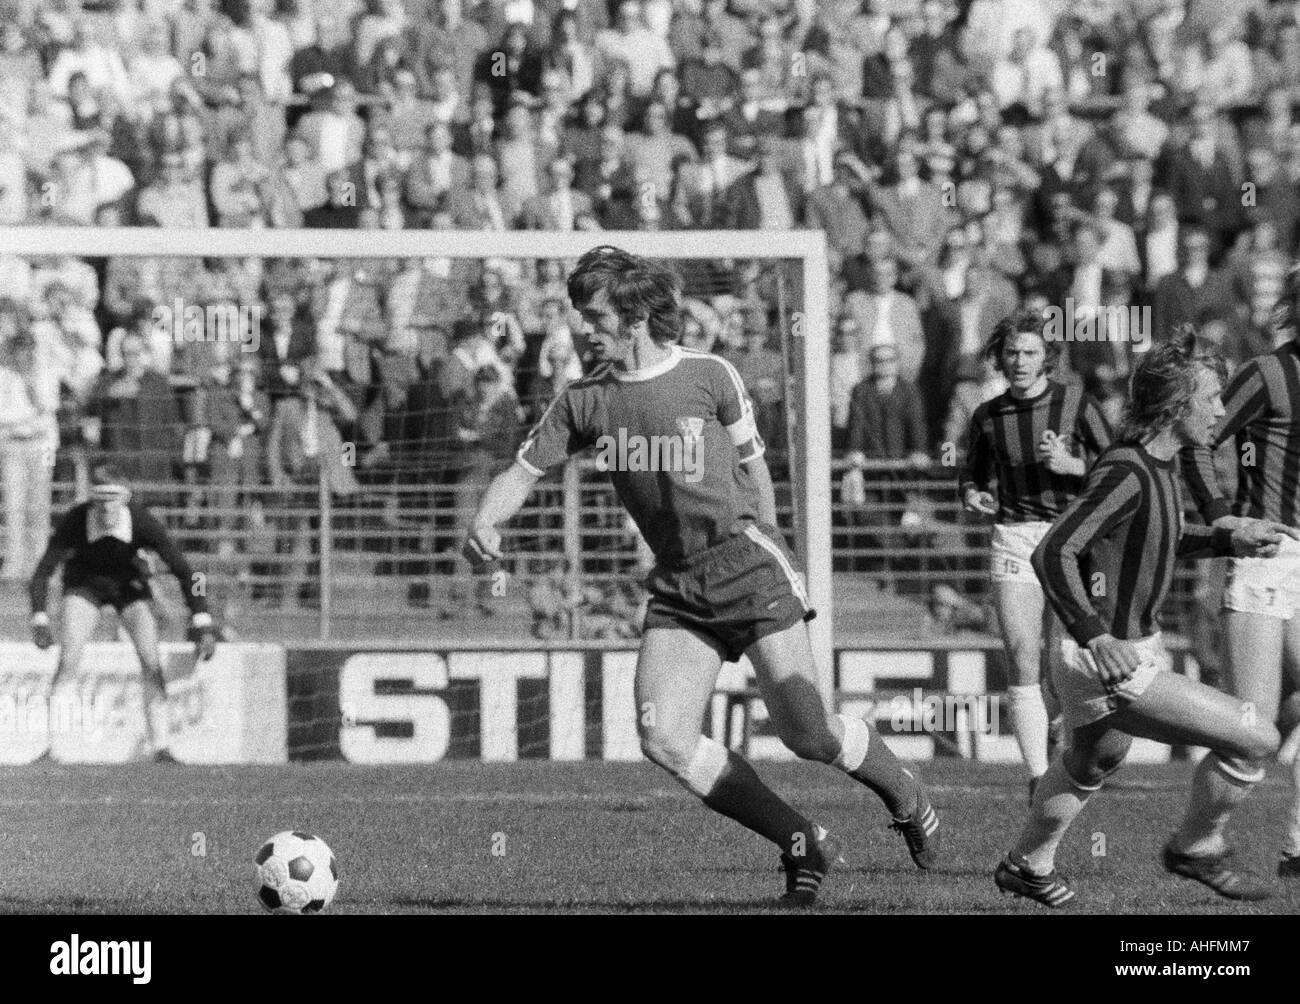 football, Bundesliga, 1971/1972, VfL Bochum versus Hanover 96 2:2, Stadium at the Castroper Strasse in Bochum, scene of the match, f.l.t.r. Hans Walitza (Bochum), Peter Ruehmkorb (96), Juergen Bandura Bertl (96) - Stock Image